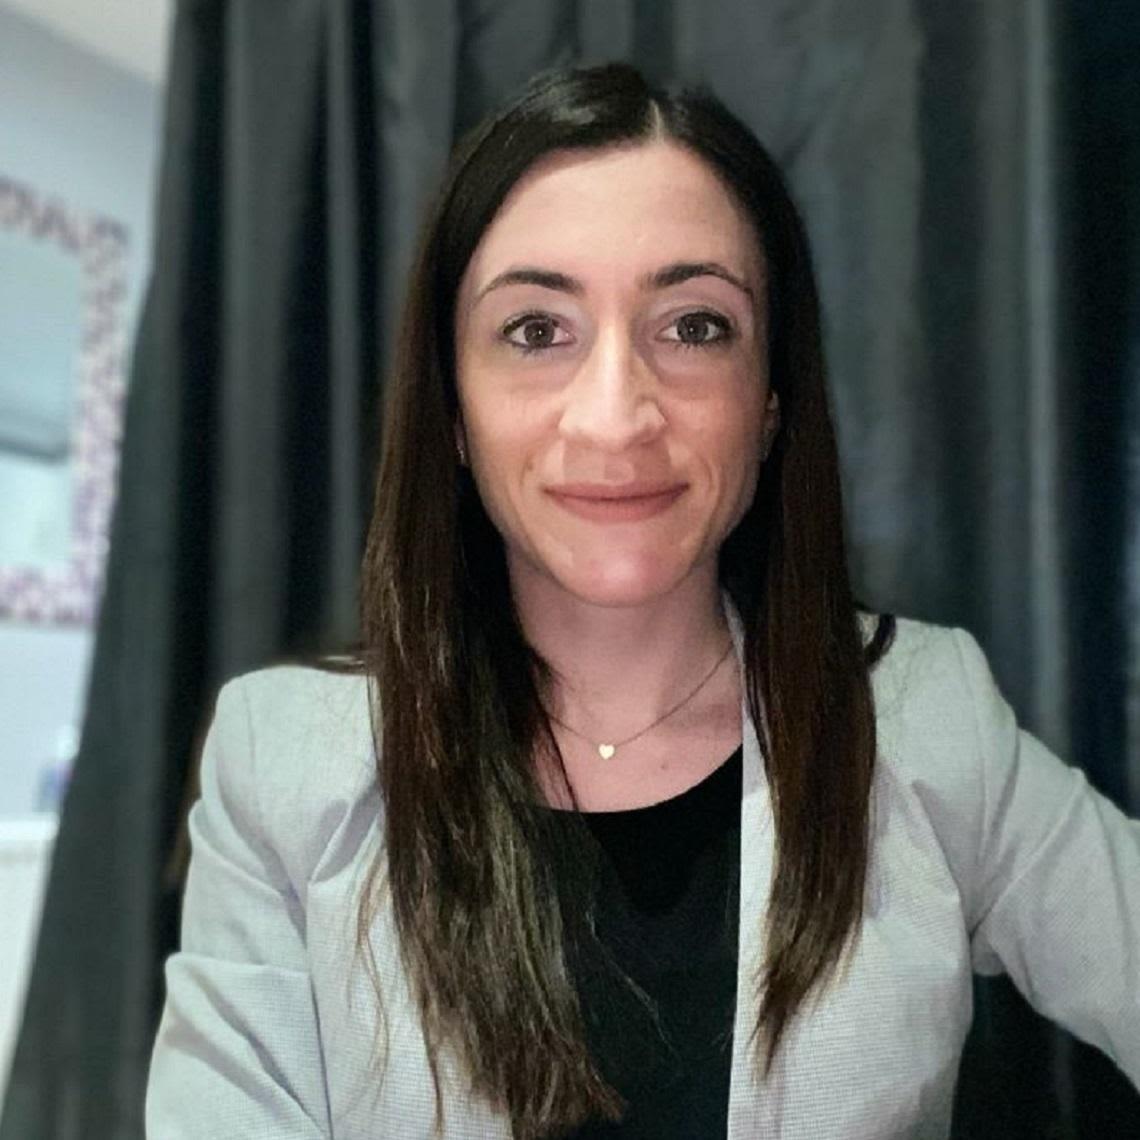 Antonella D'Amore